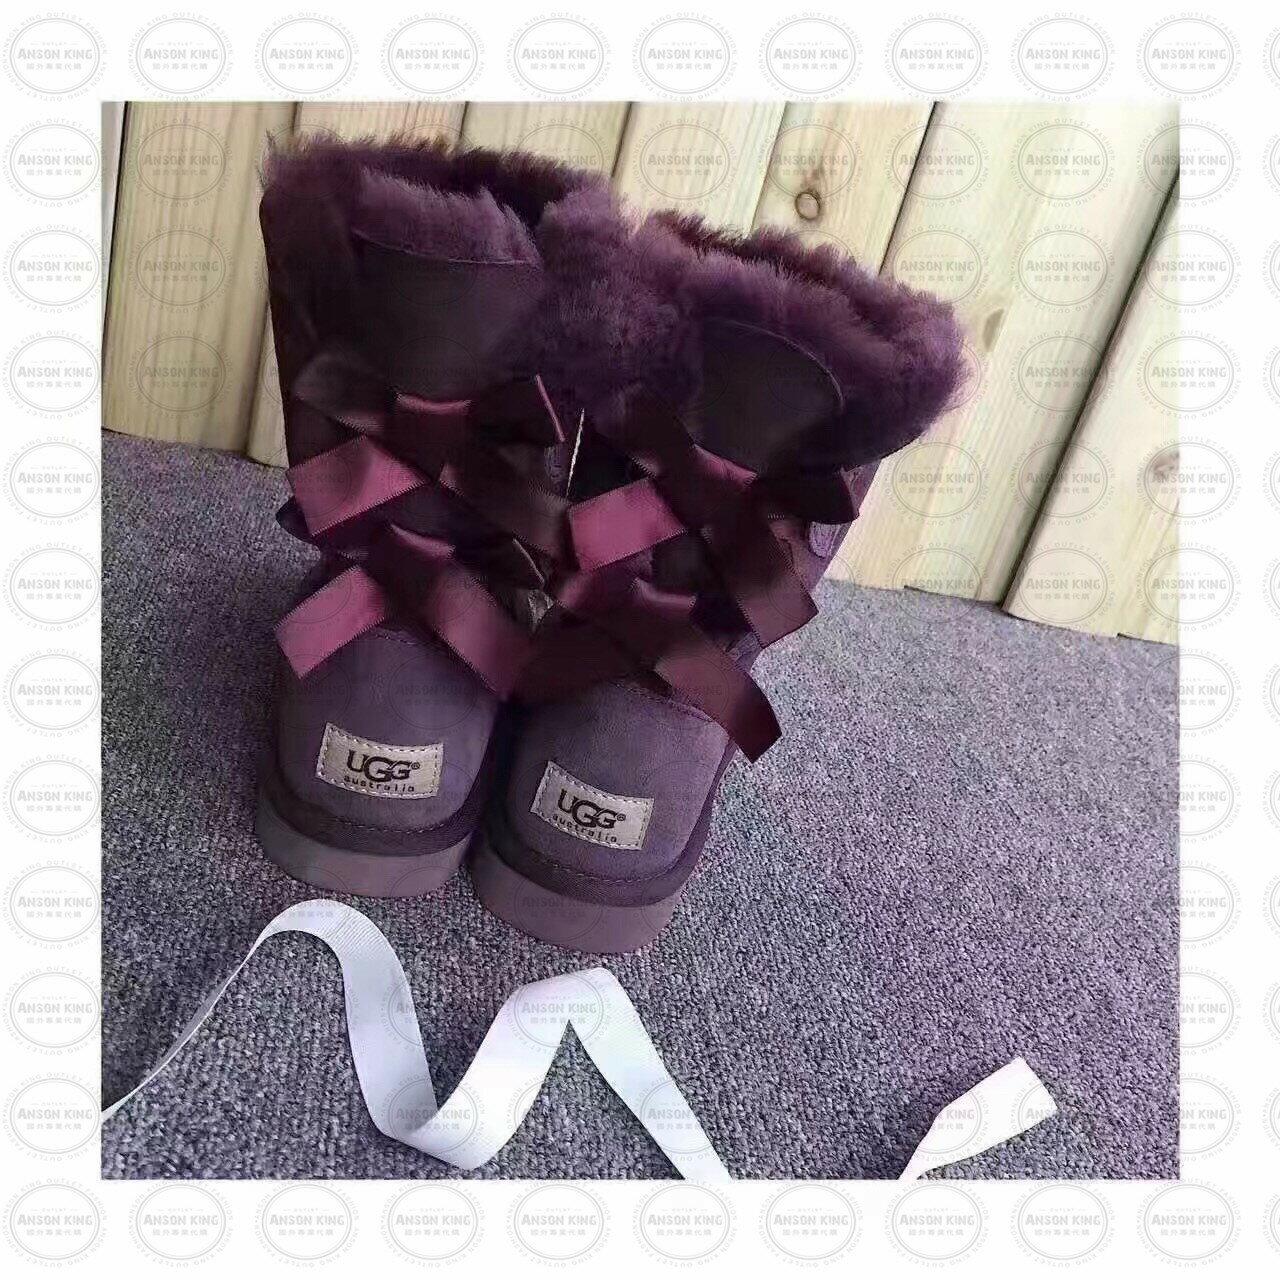 OUTLET正品代購 澳洲 UGG 蝴蝶結3280羊皮毛一體 中長靴 保暖 真皮羊皮毛 雪靴 短靴 紫色 0